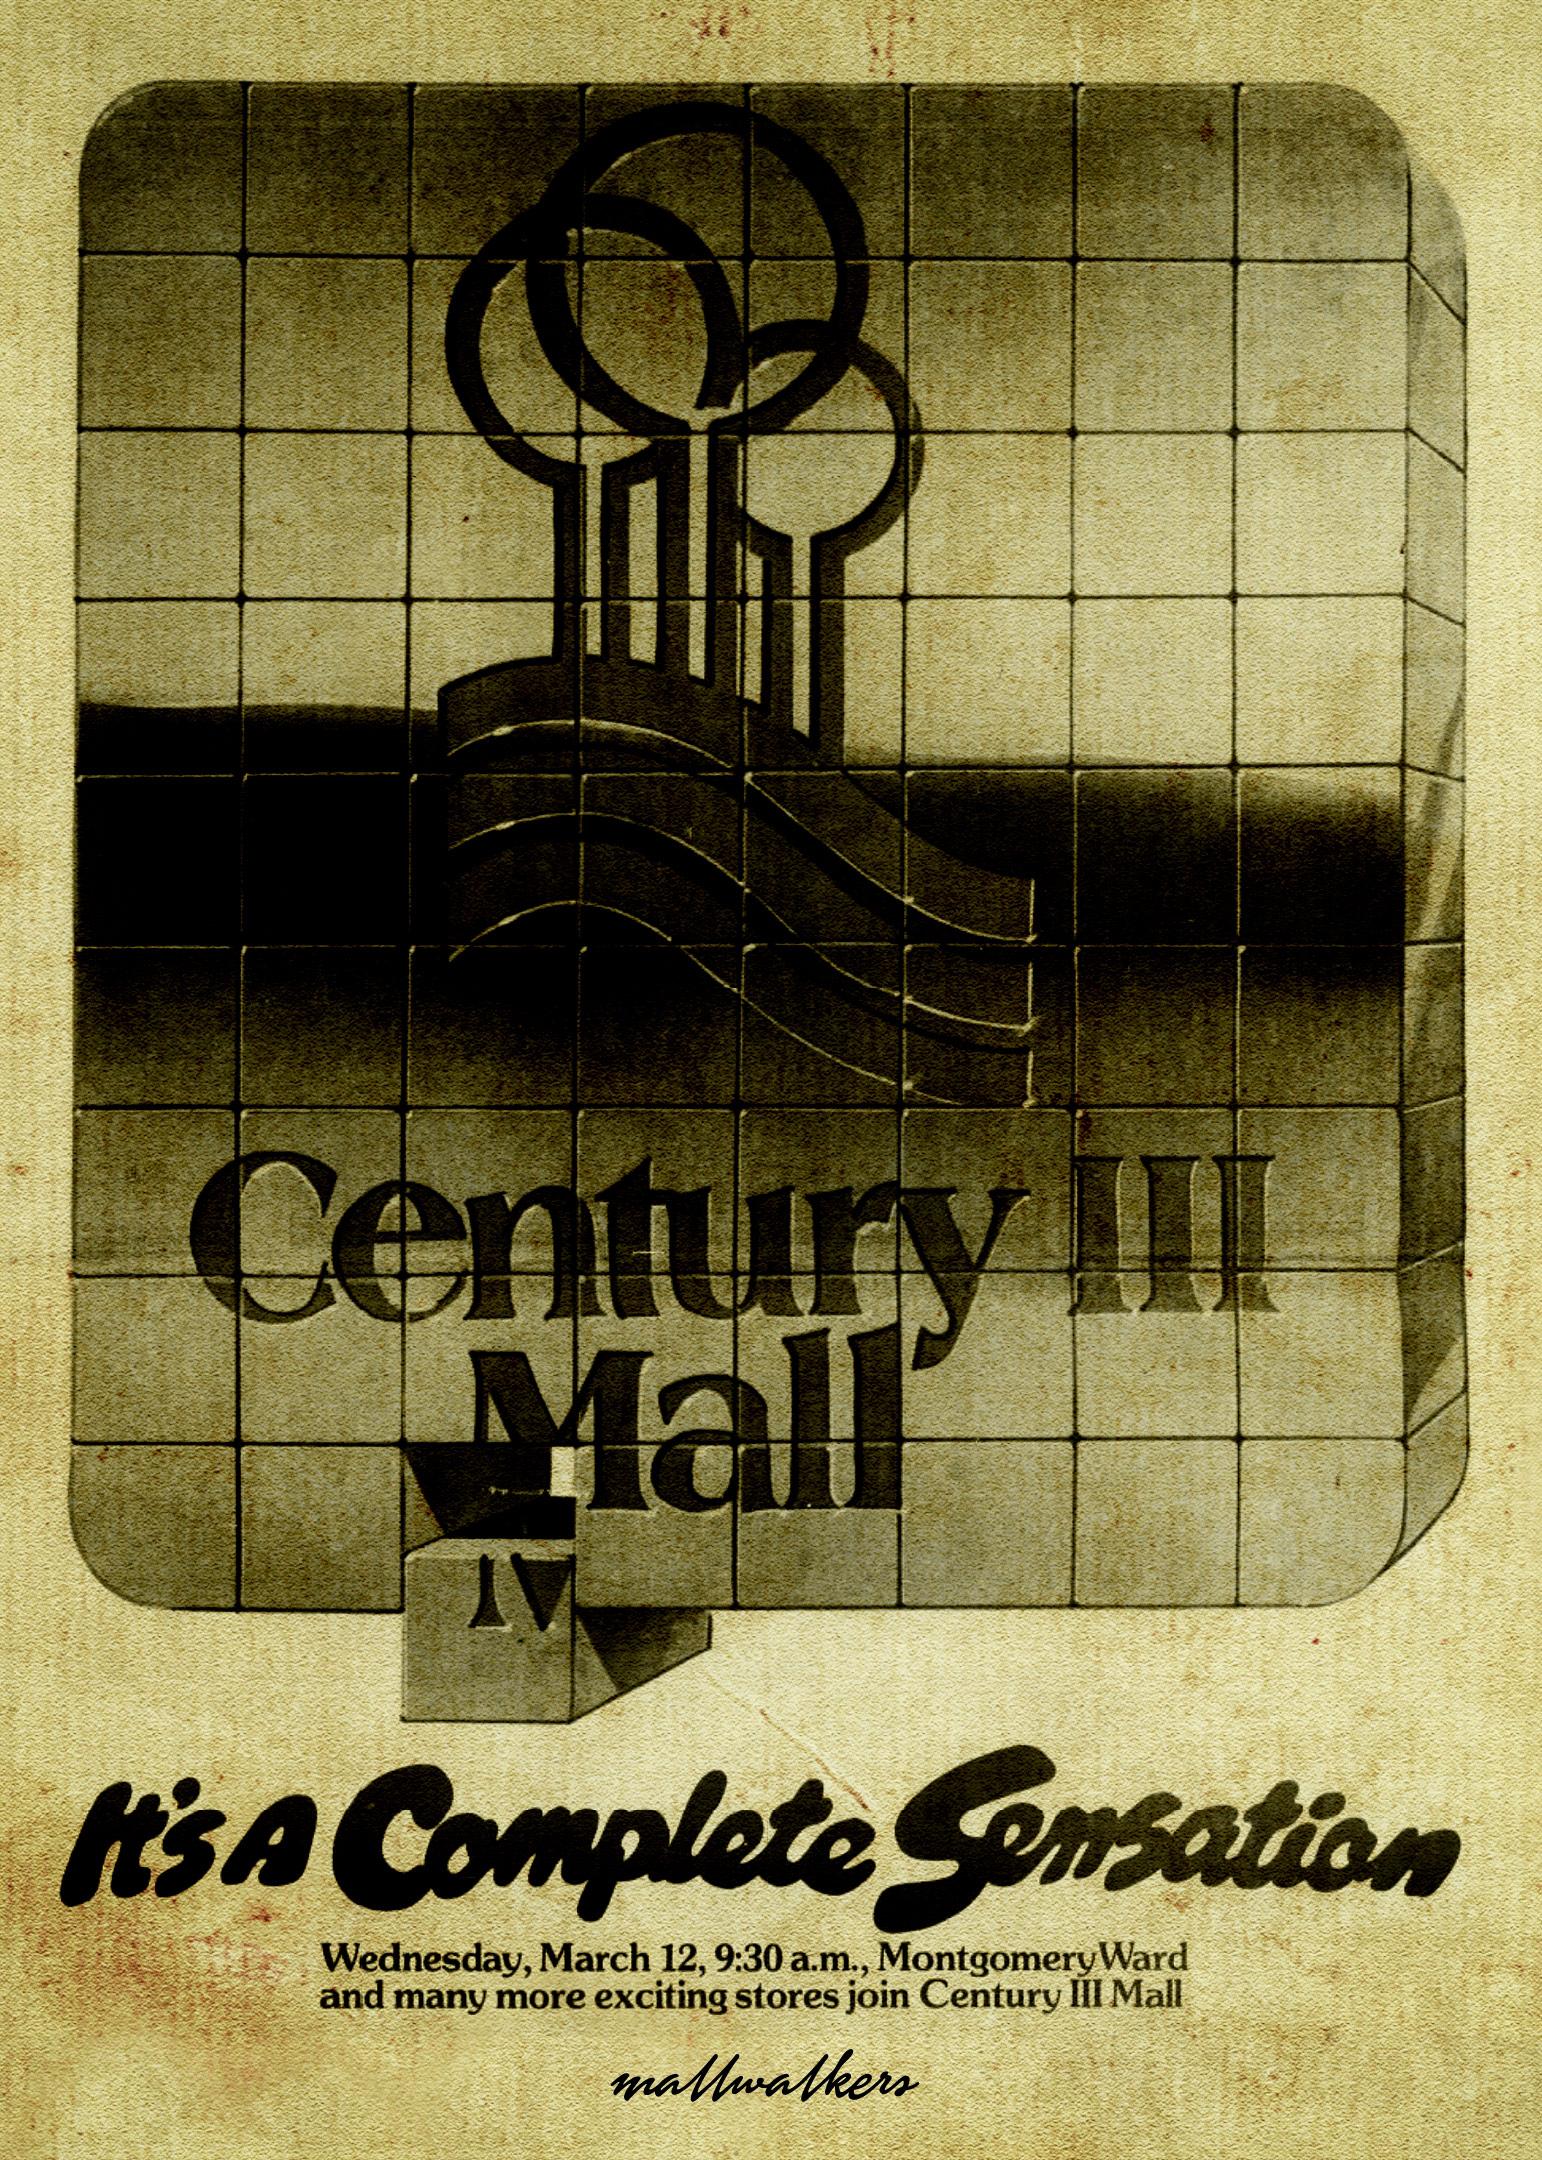 Century III Mall Advertisement